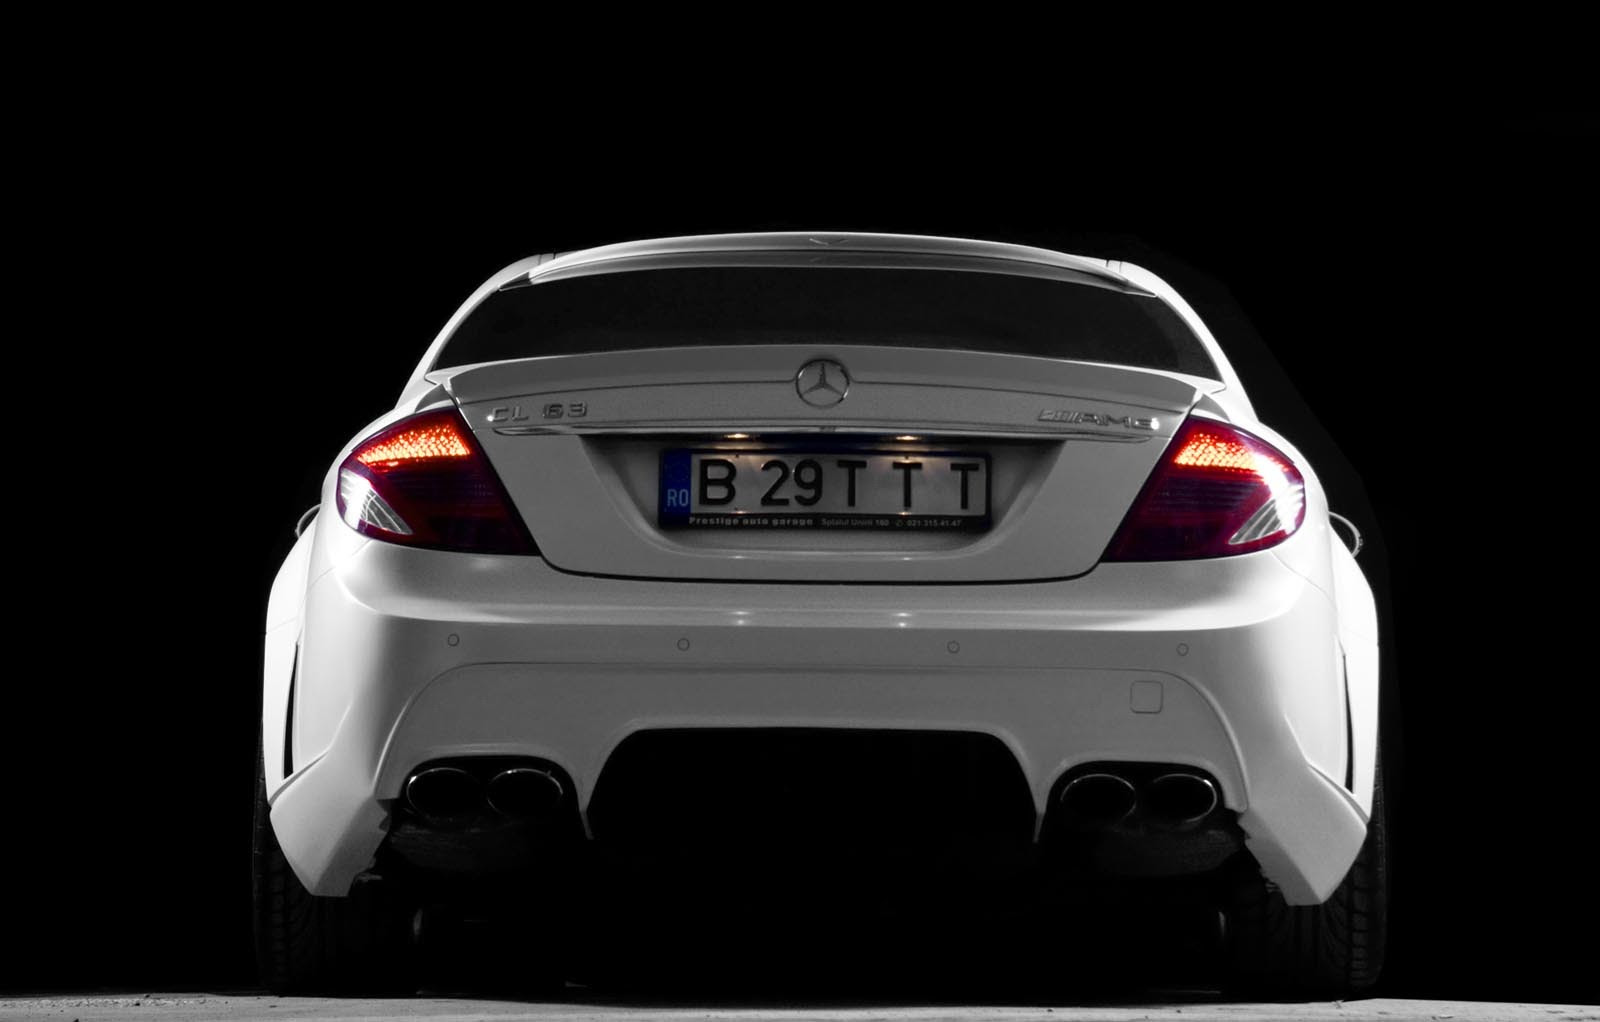 Imagini - Pictorial: Alexandra şi Mercedes-Benz CL 63 AMG